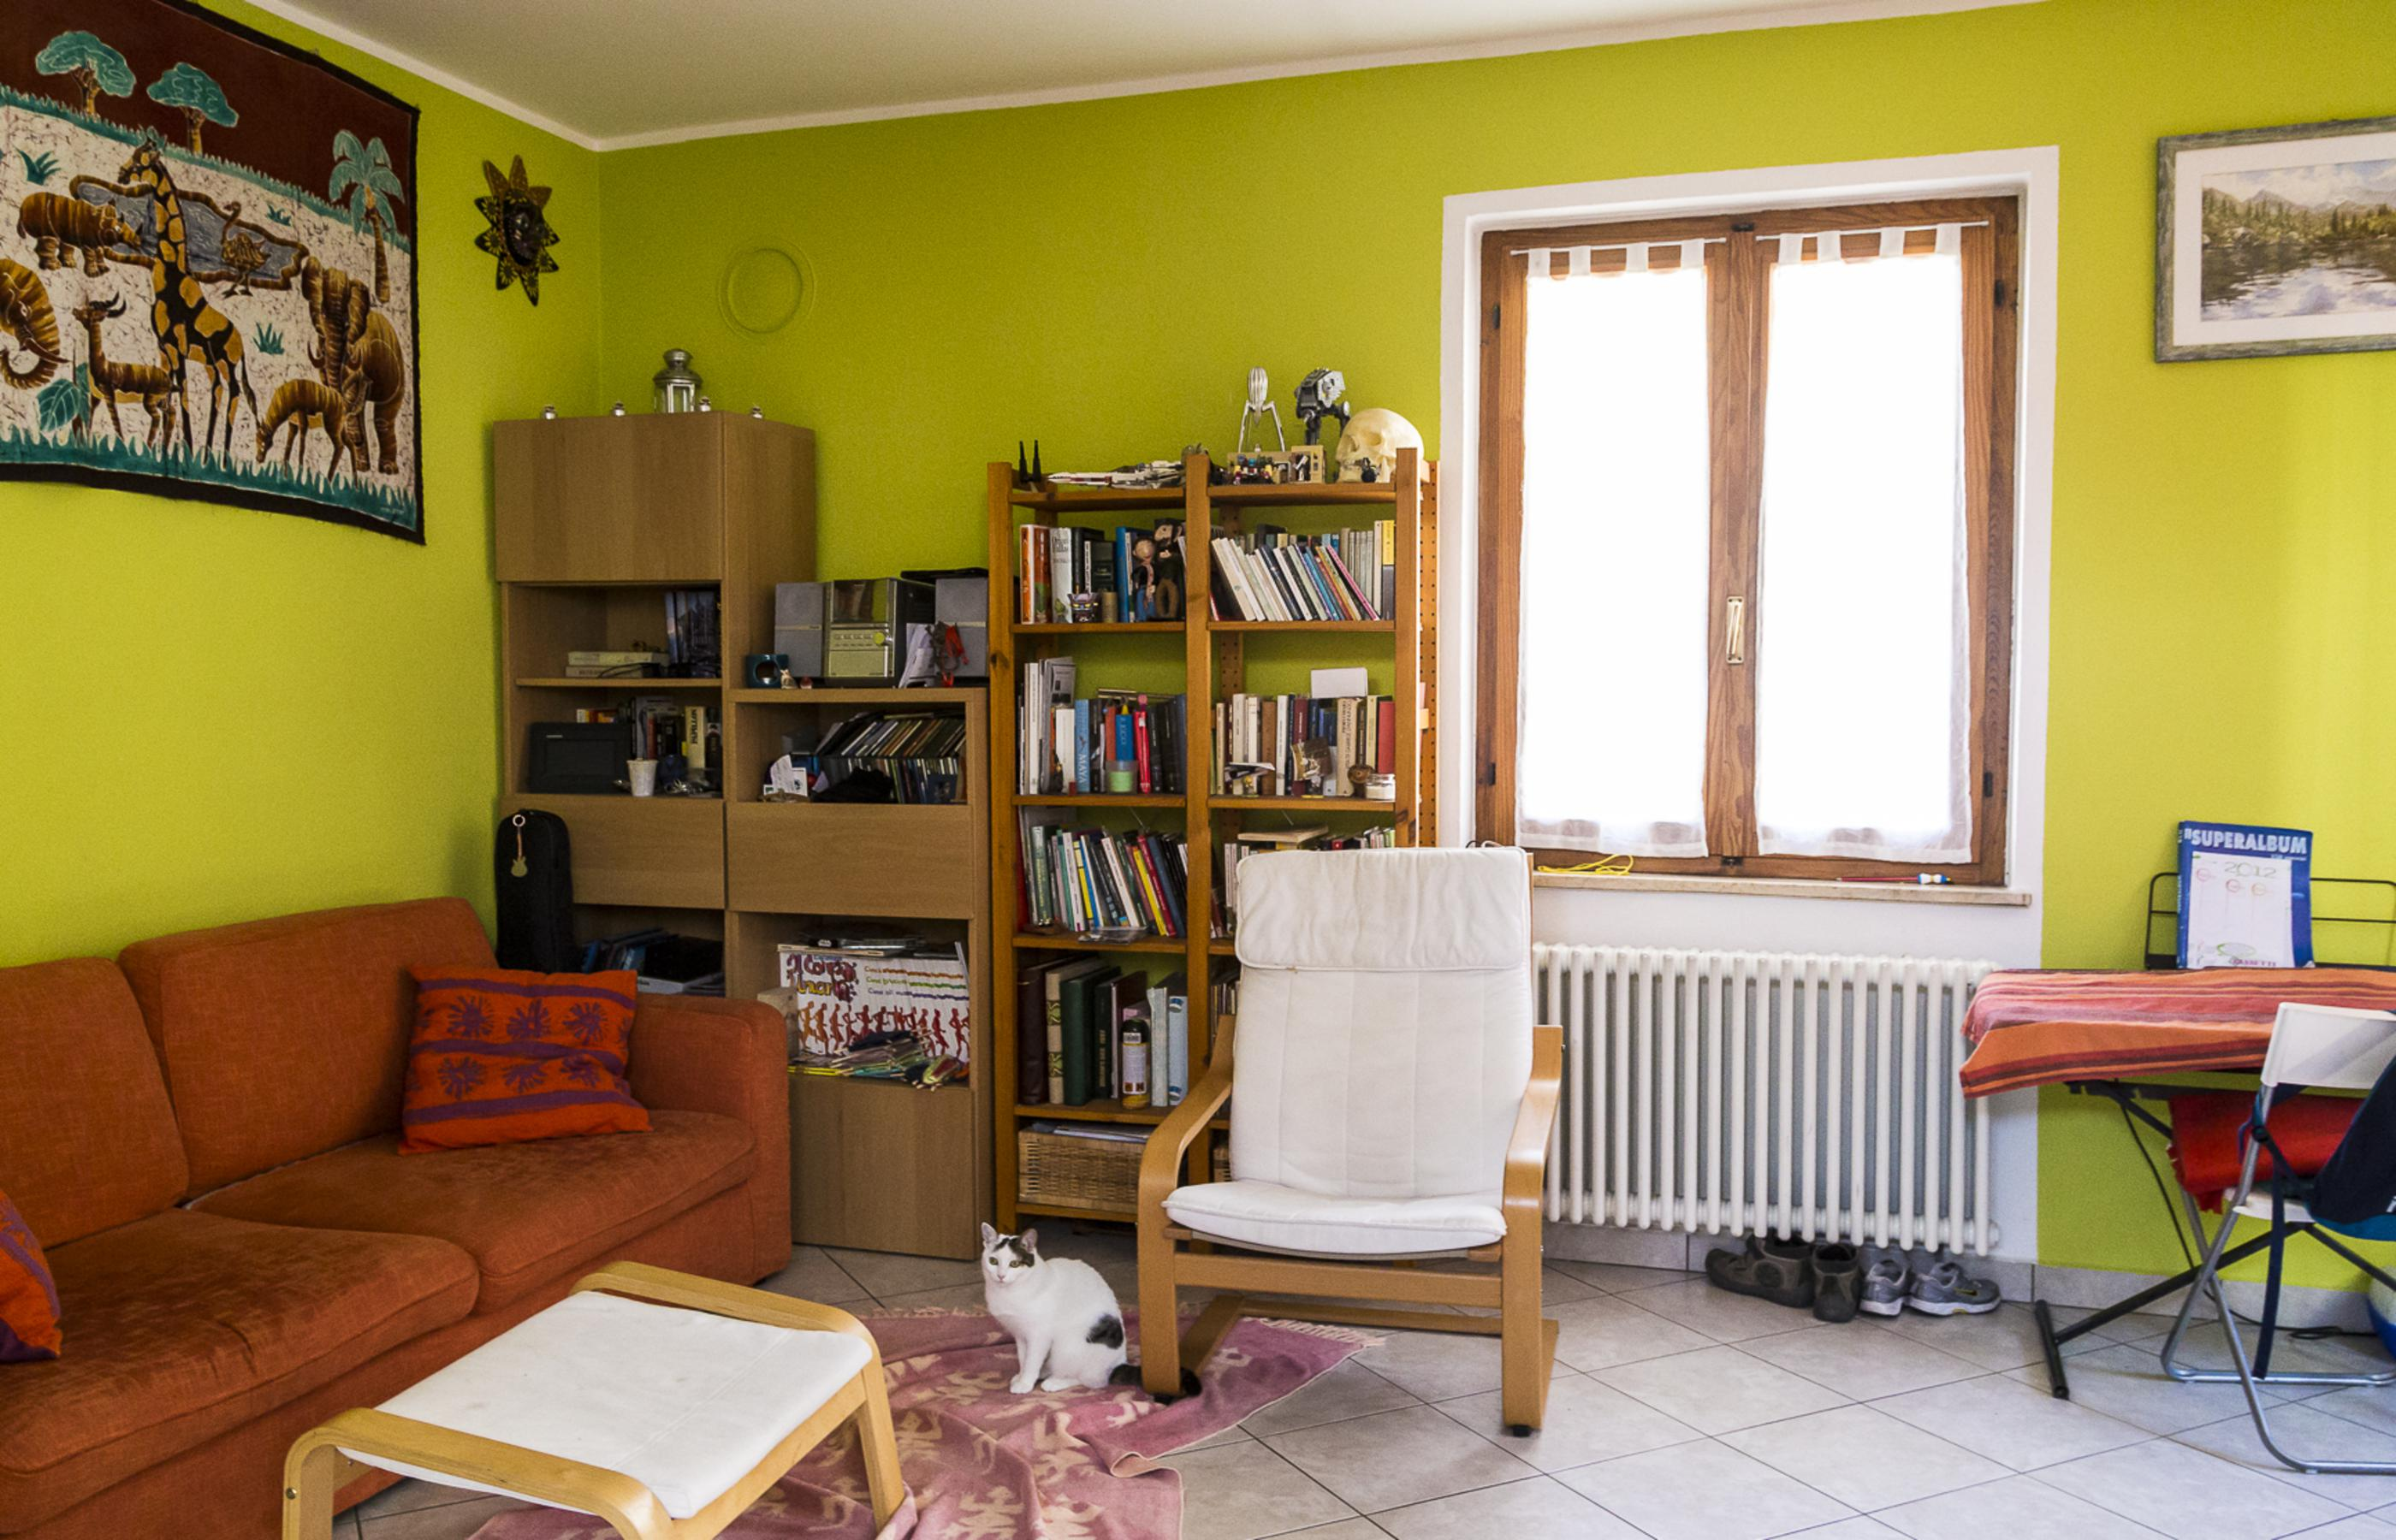 CARCEGNA Appartamento con due camere e giardino